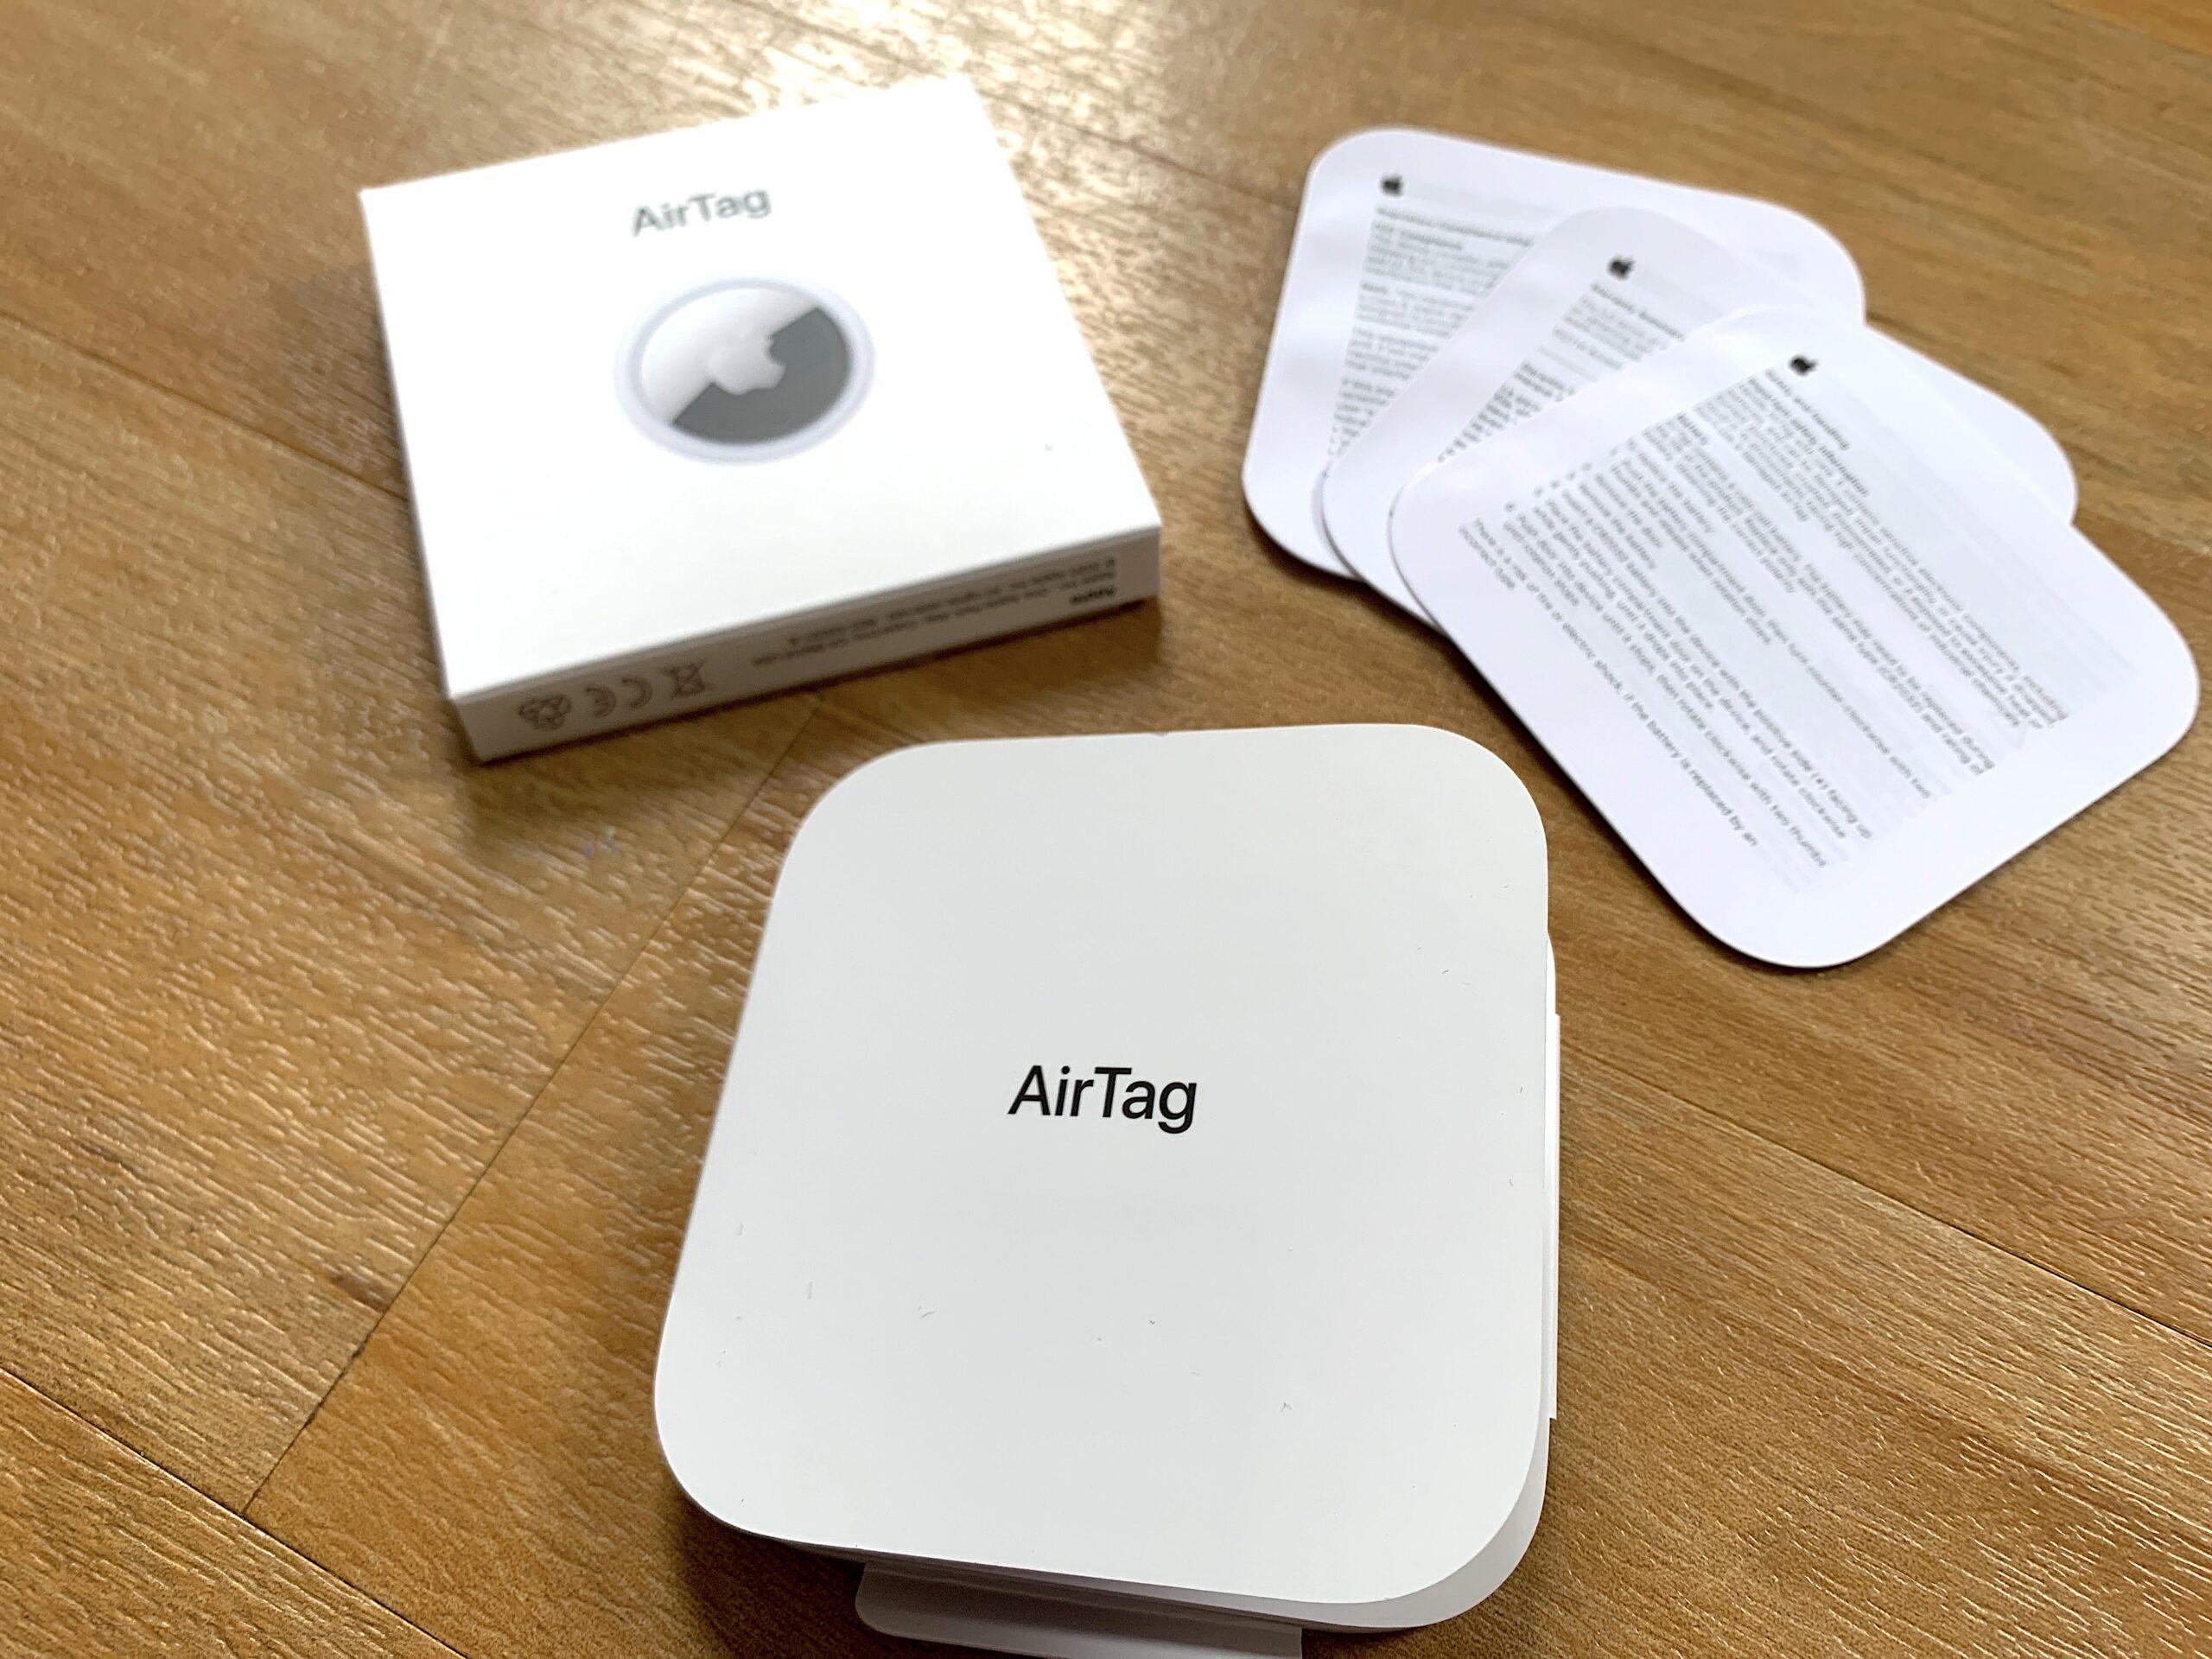 Apple AirTag boxes